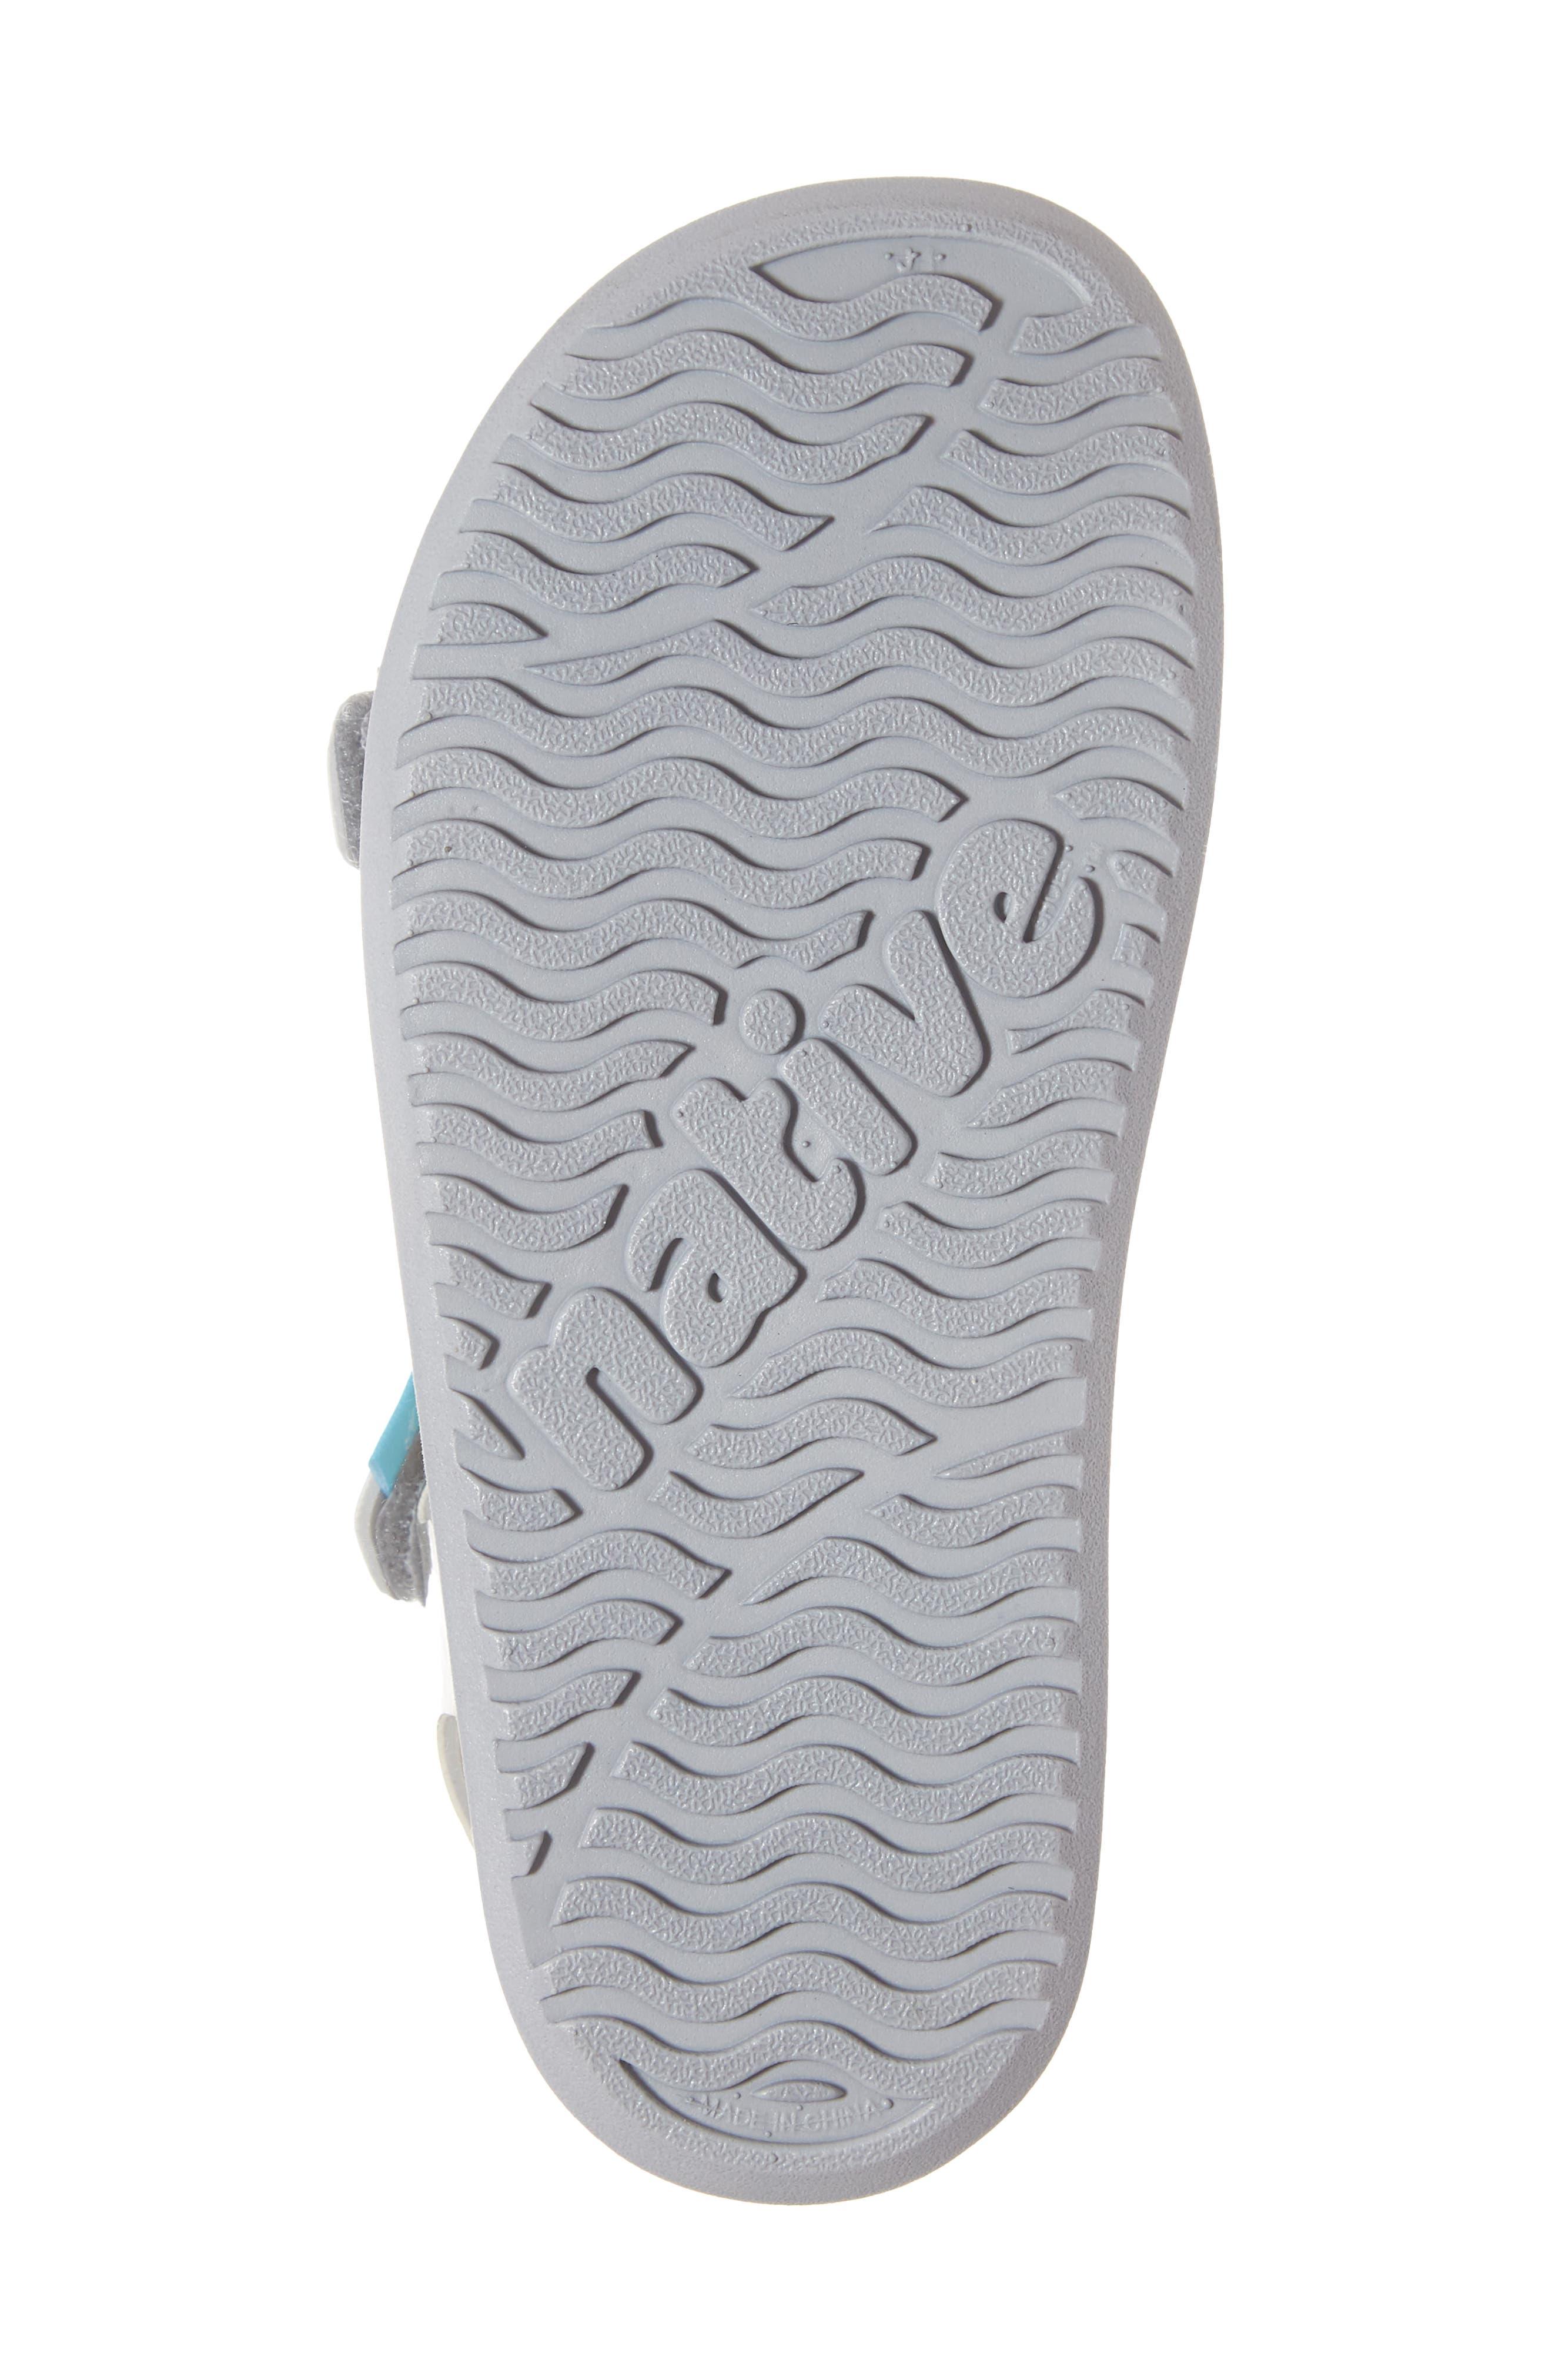 Charley Child Waterproof Flat Vegan Sandal,                             Alternate thumbnail 6, color,                             SILVER GLITTER/ WHITE/ GREY